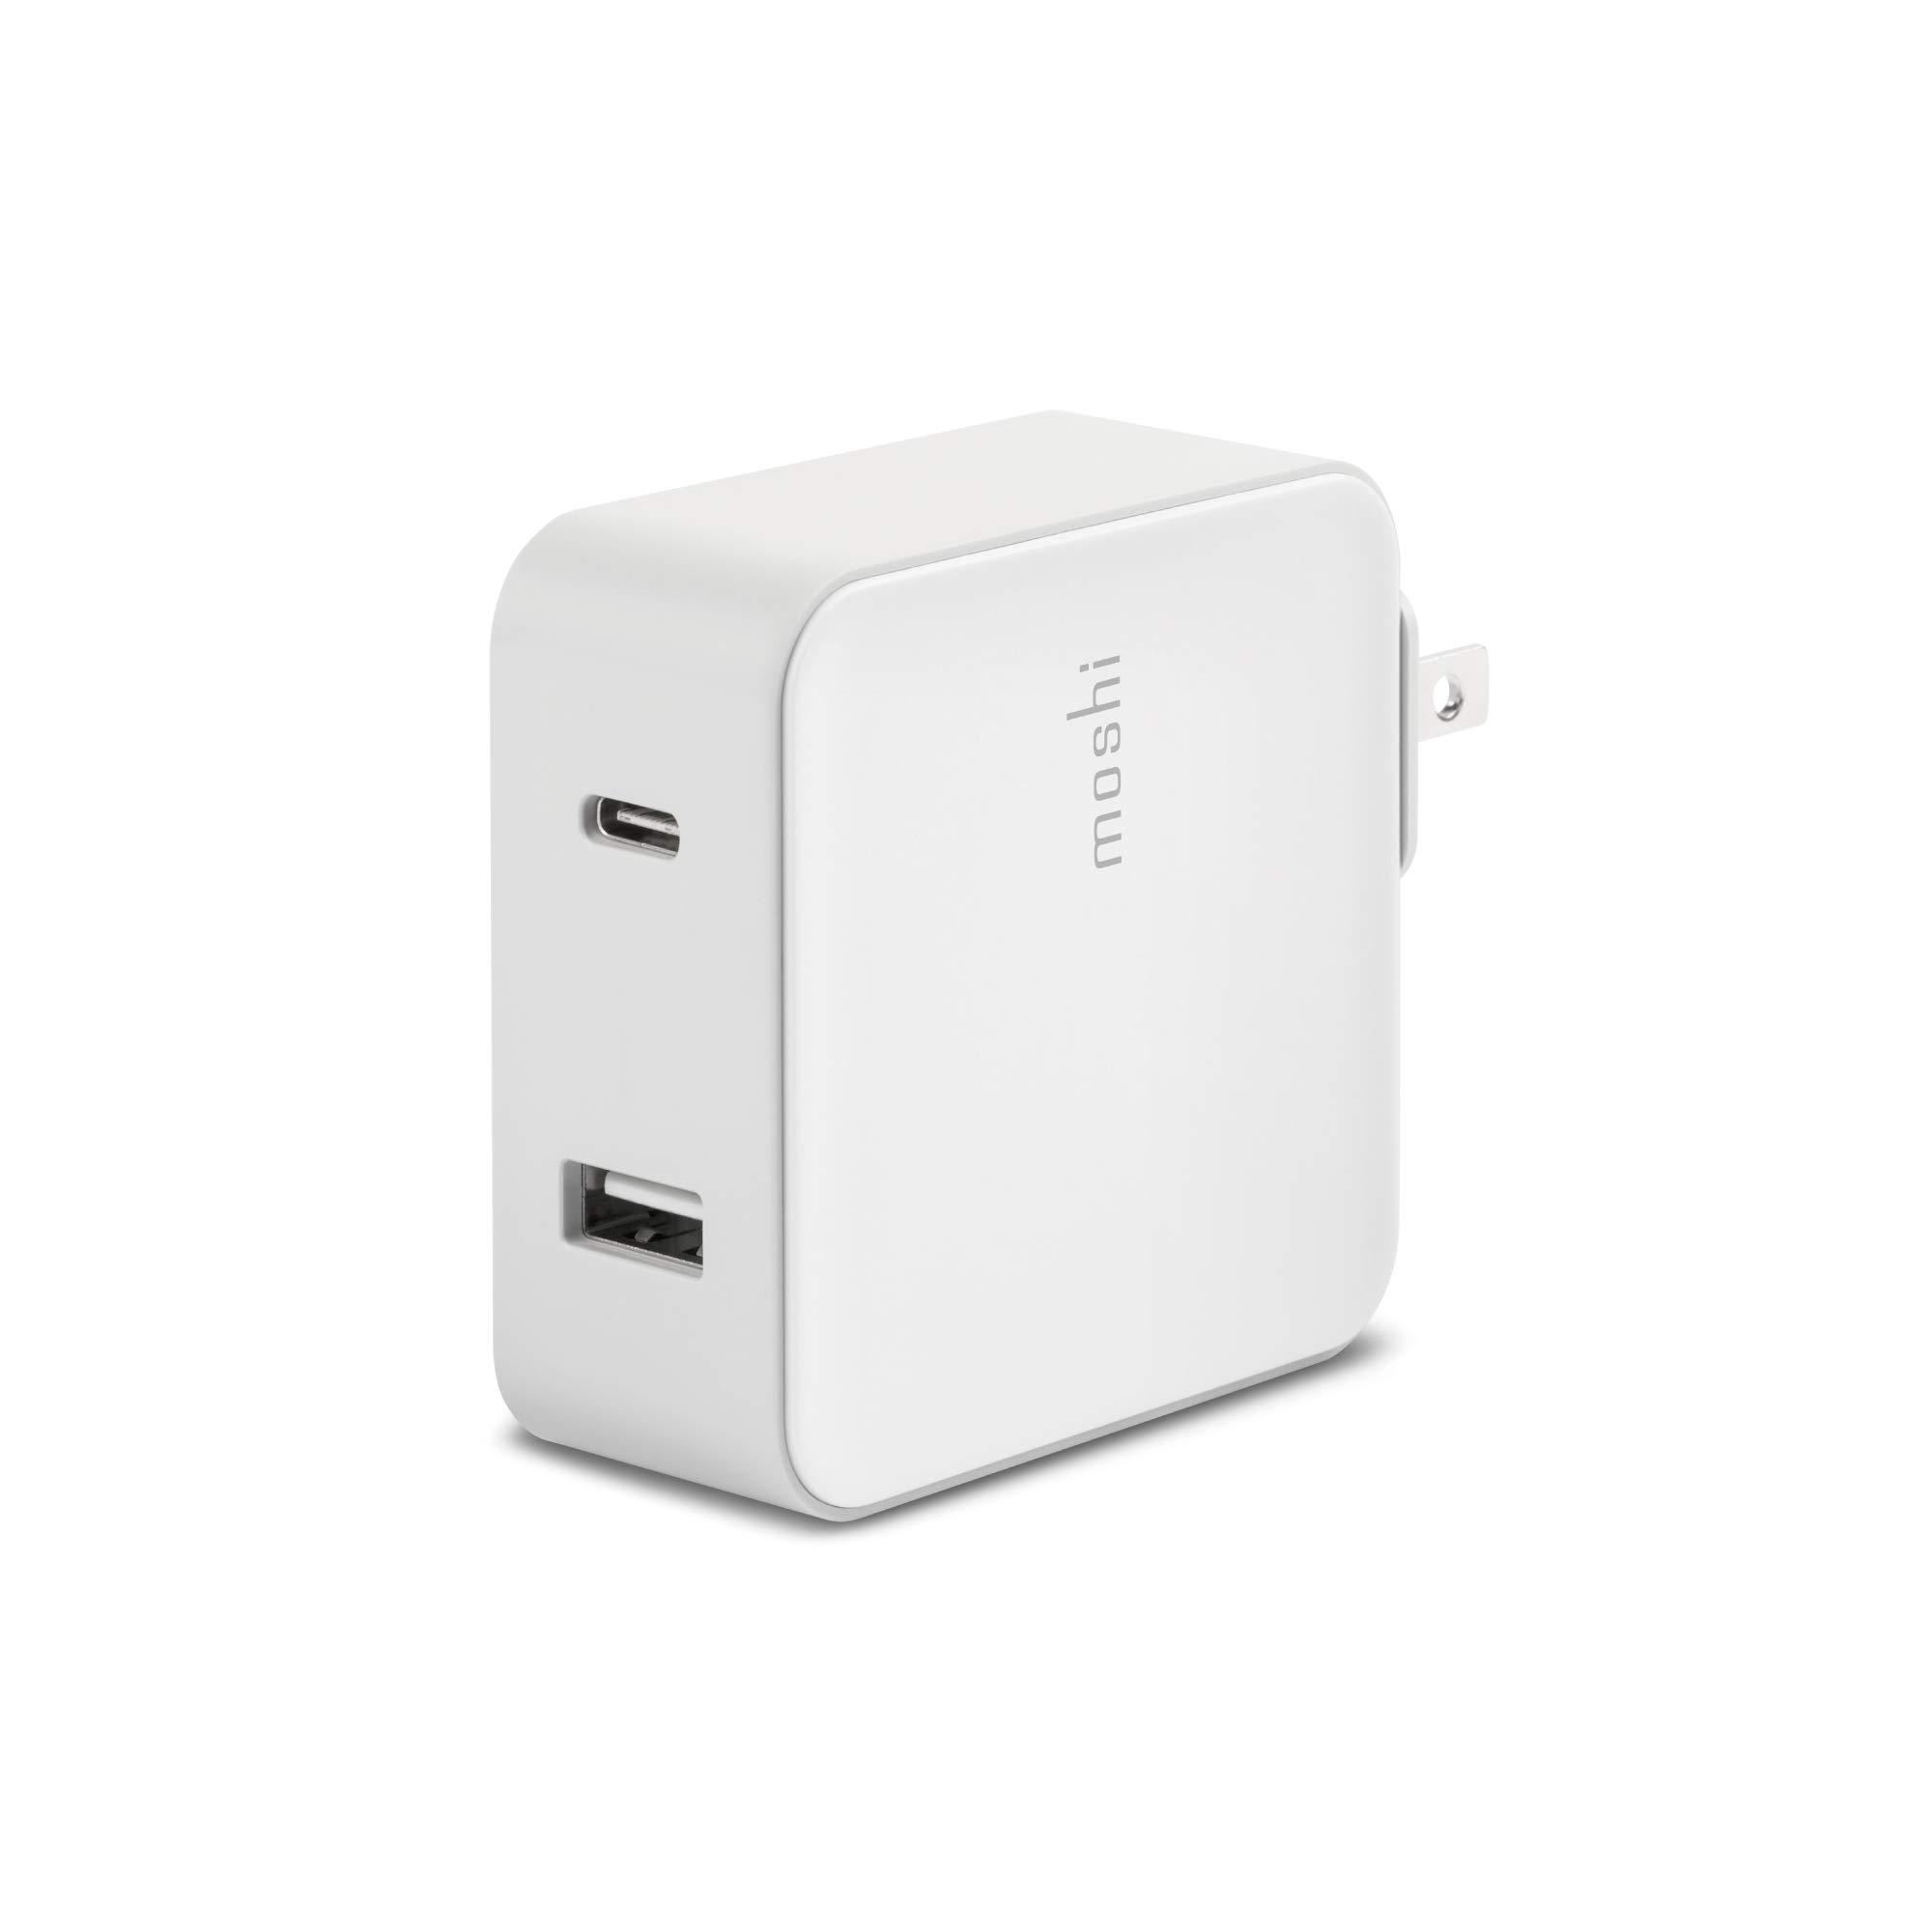 Moshi ProGeo USB-C Wall Charger (42 W, US), USB-C and USB, PD3.0 and QC3.0 by Moshi